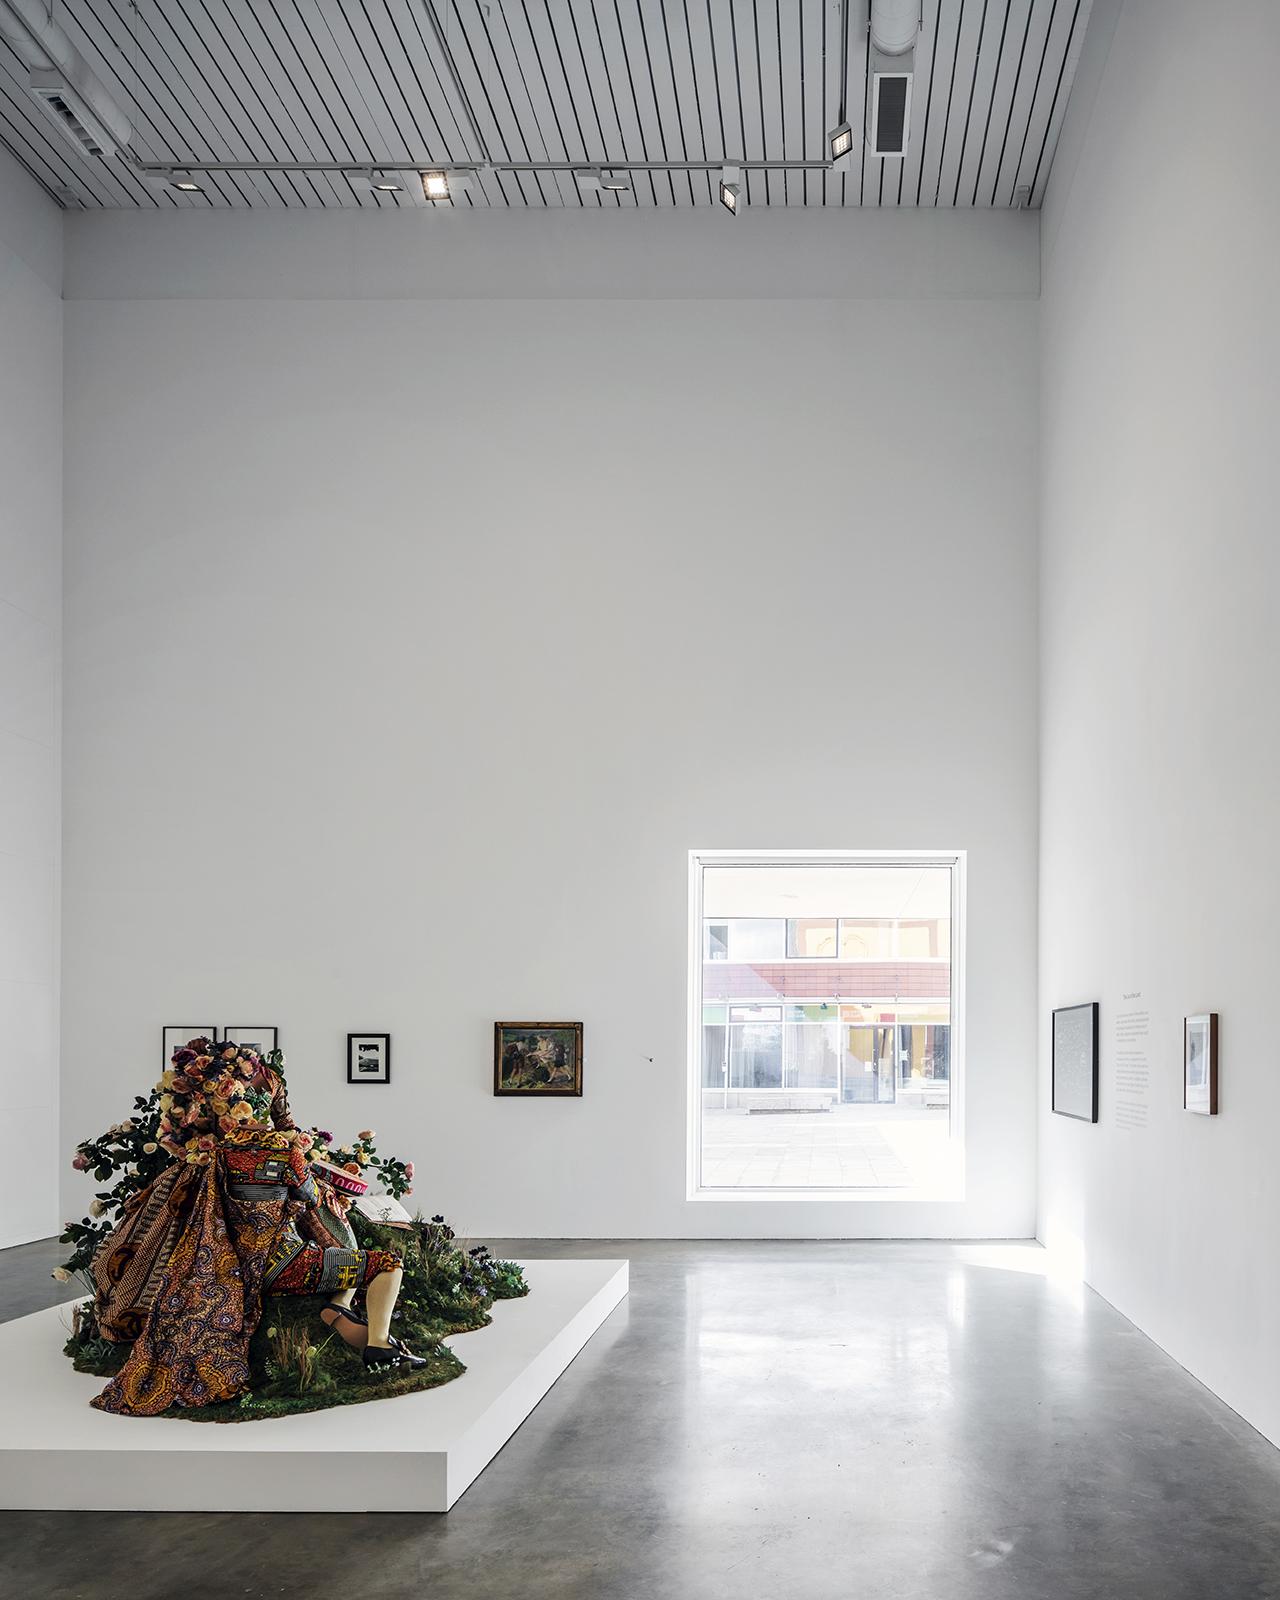 33_MK-Gallery-photo-Johan Dehlin.jpg